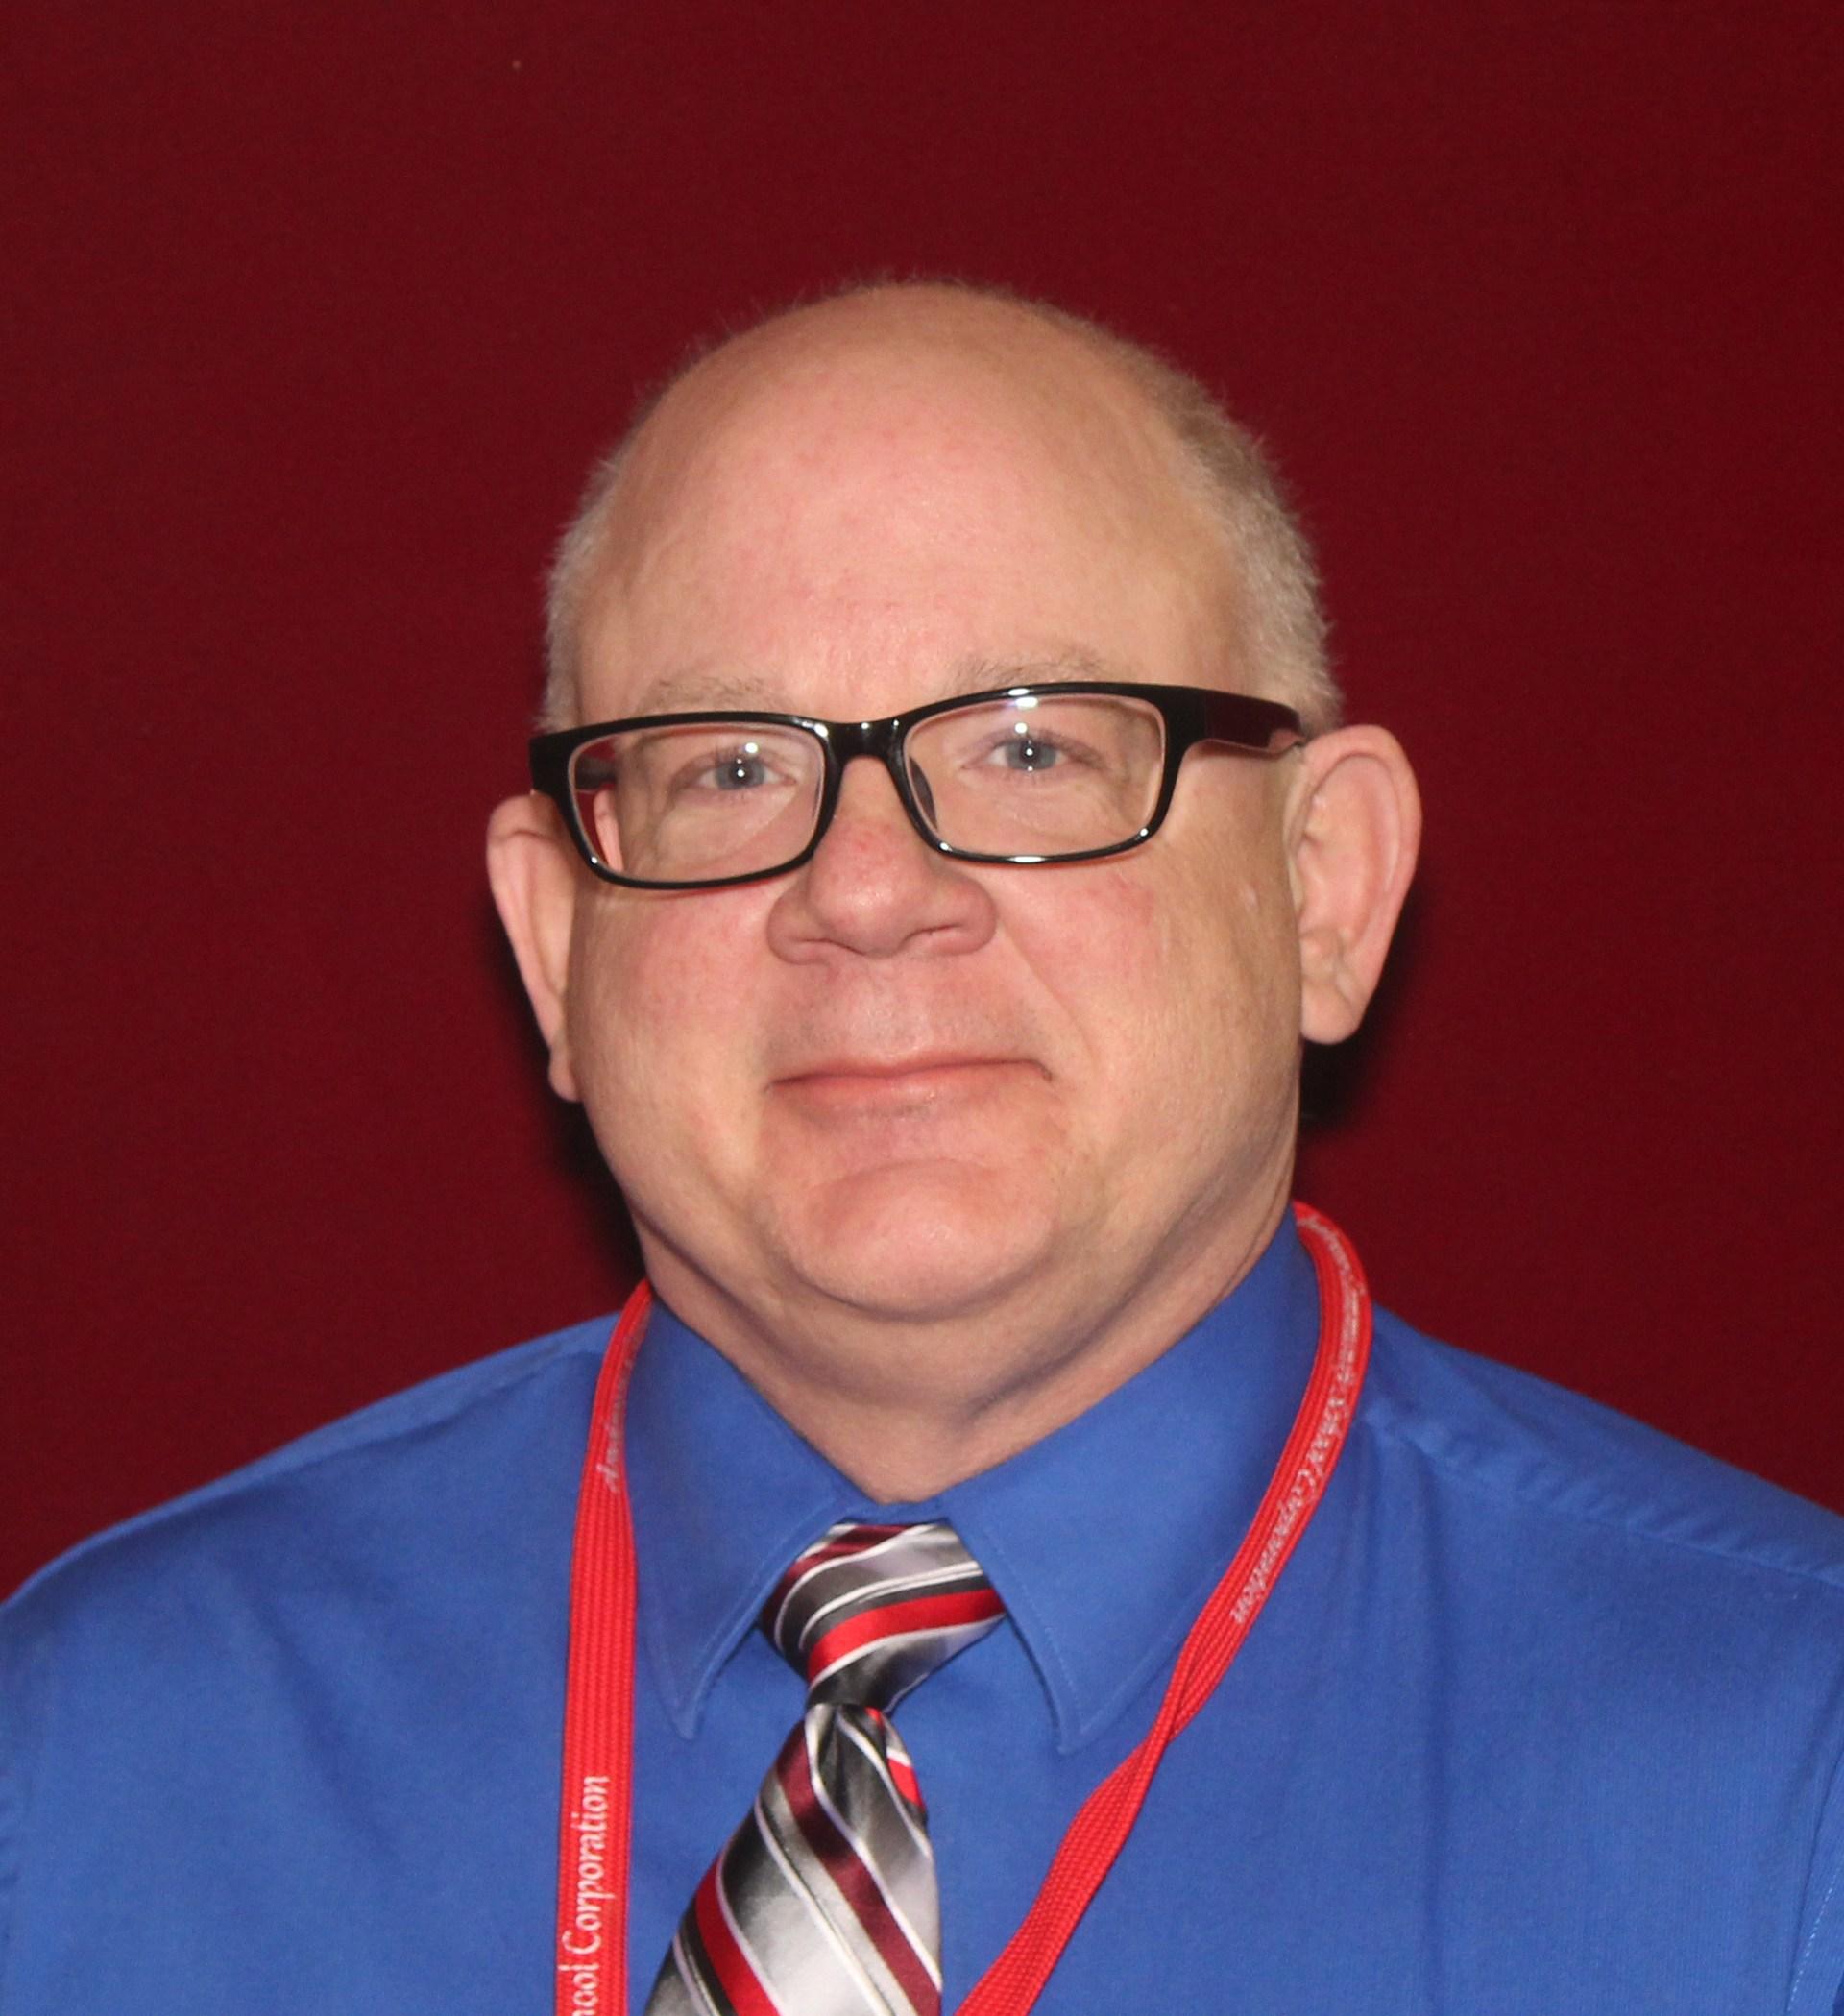 Dr. Joseph Cronk